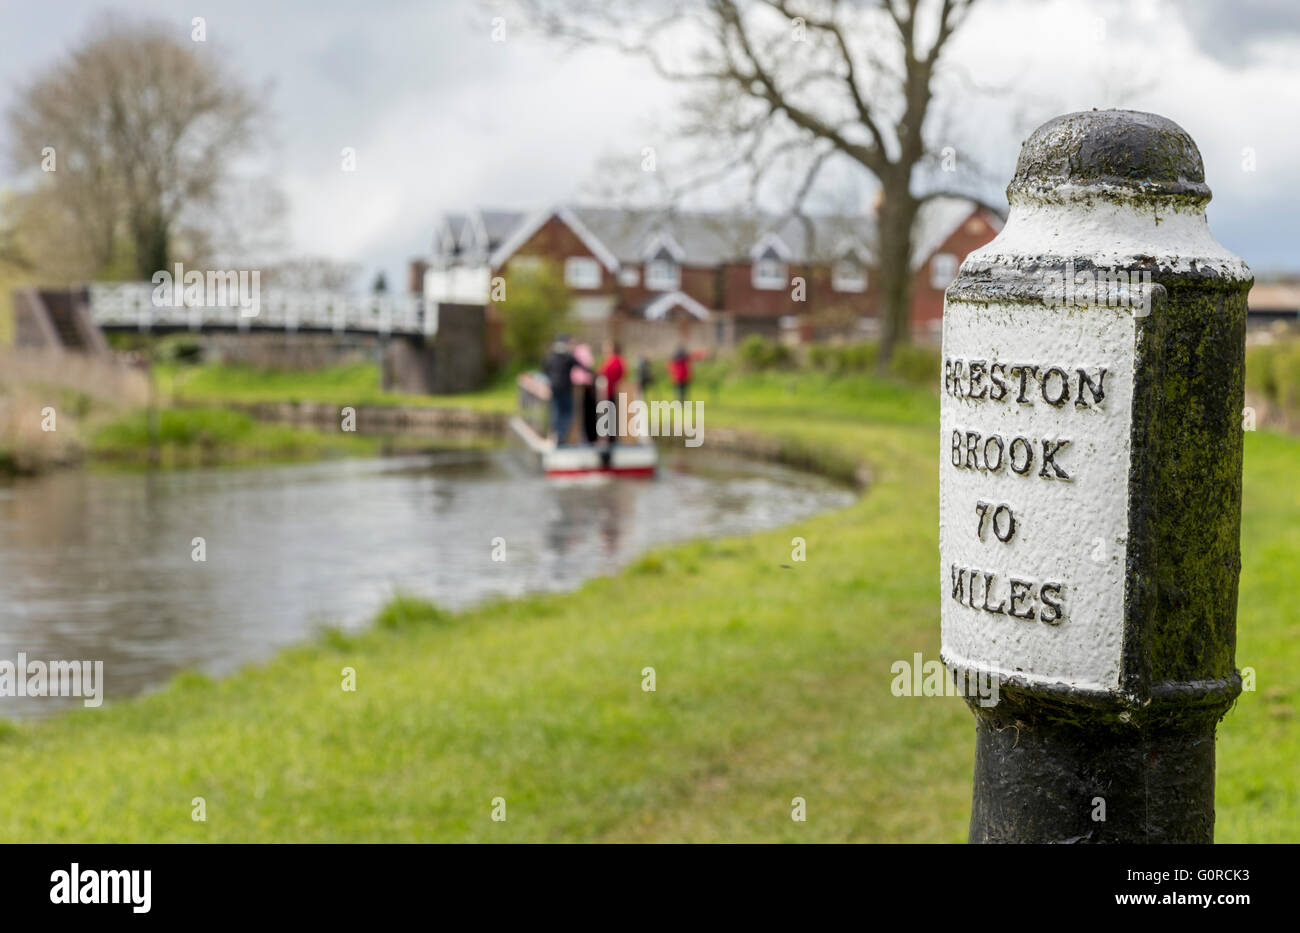 Preston brook canal